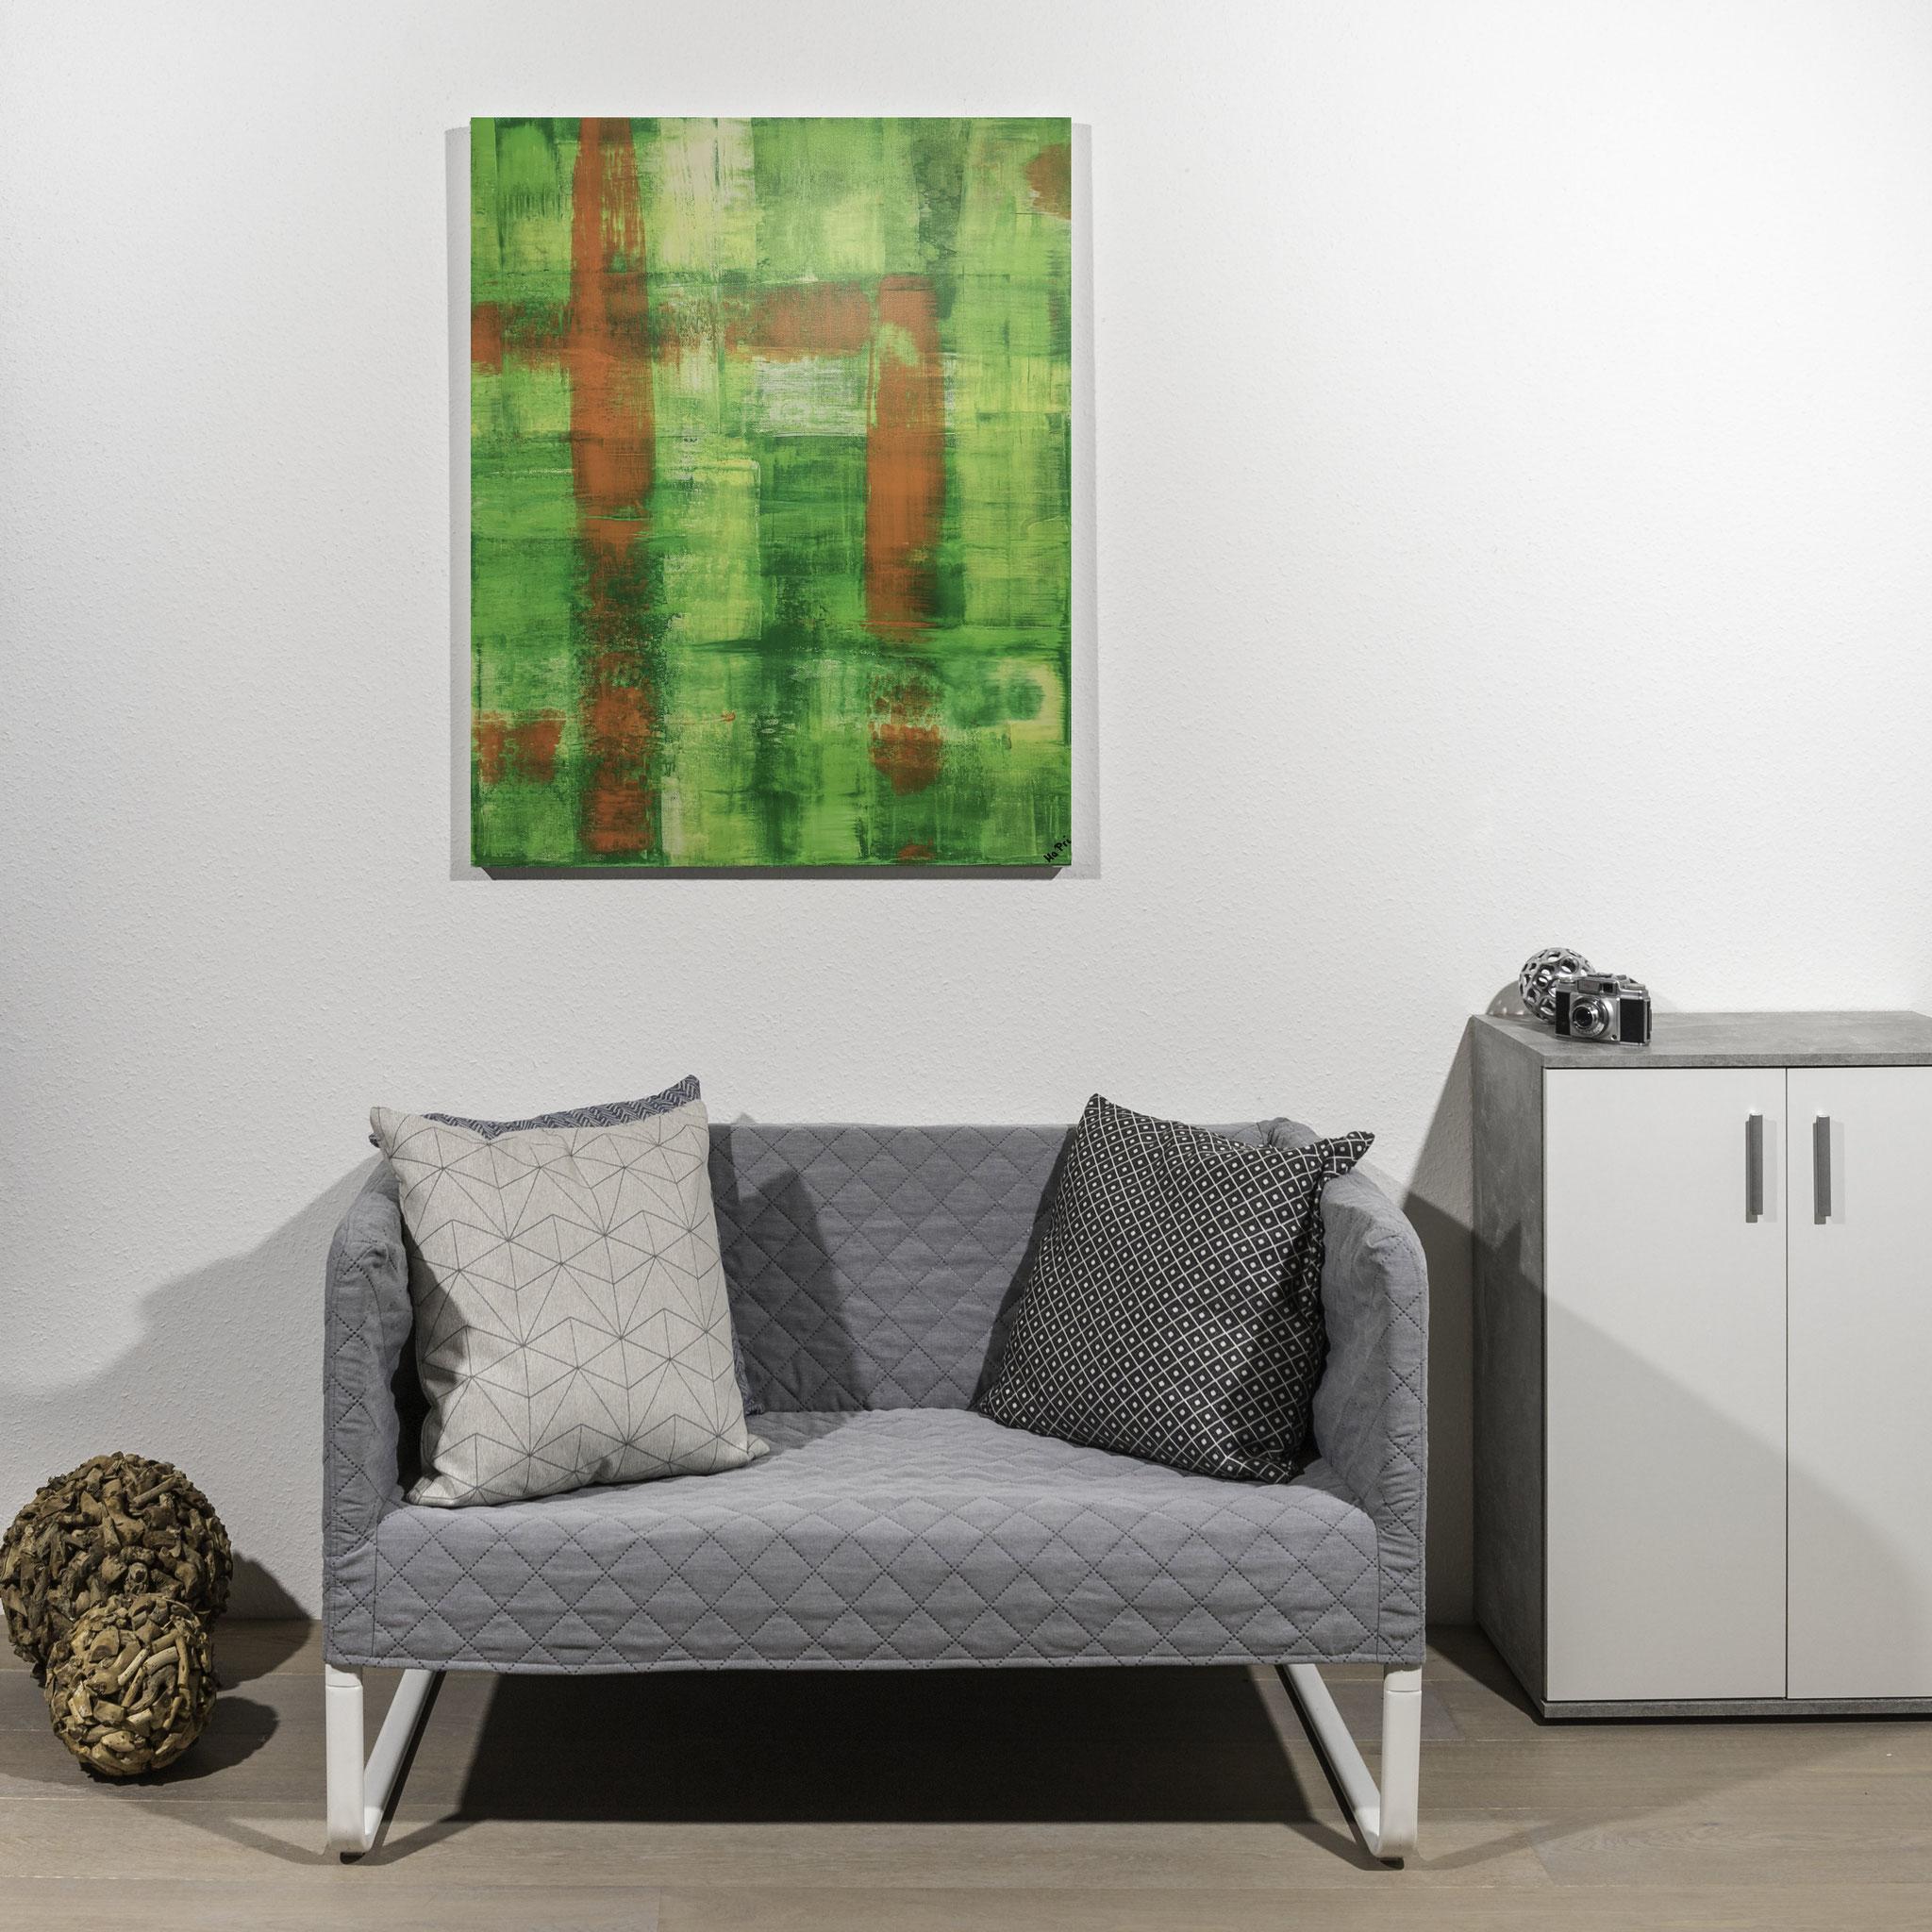 #53  grüner Traum                 100 x 80cm